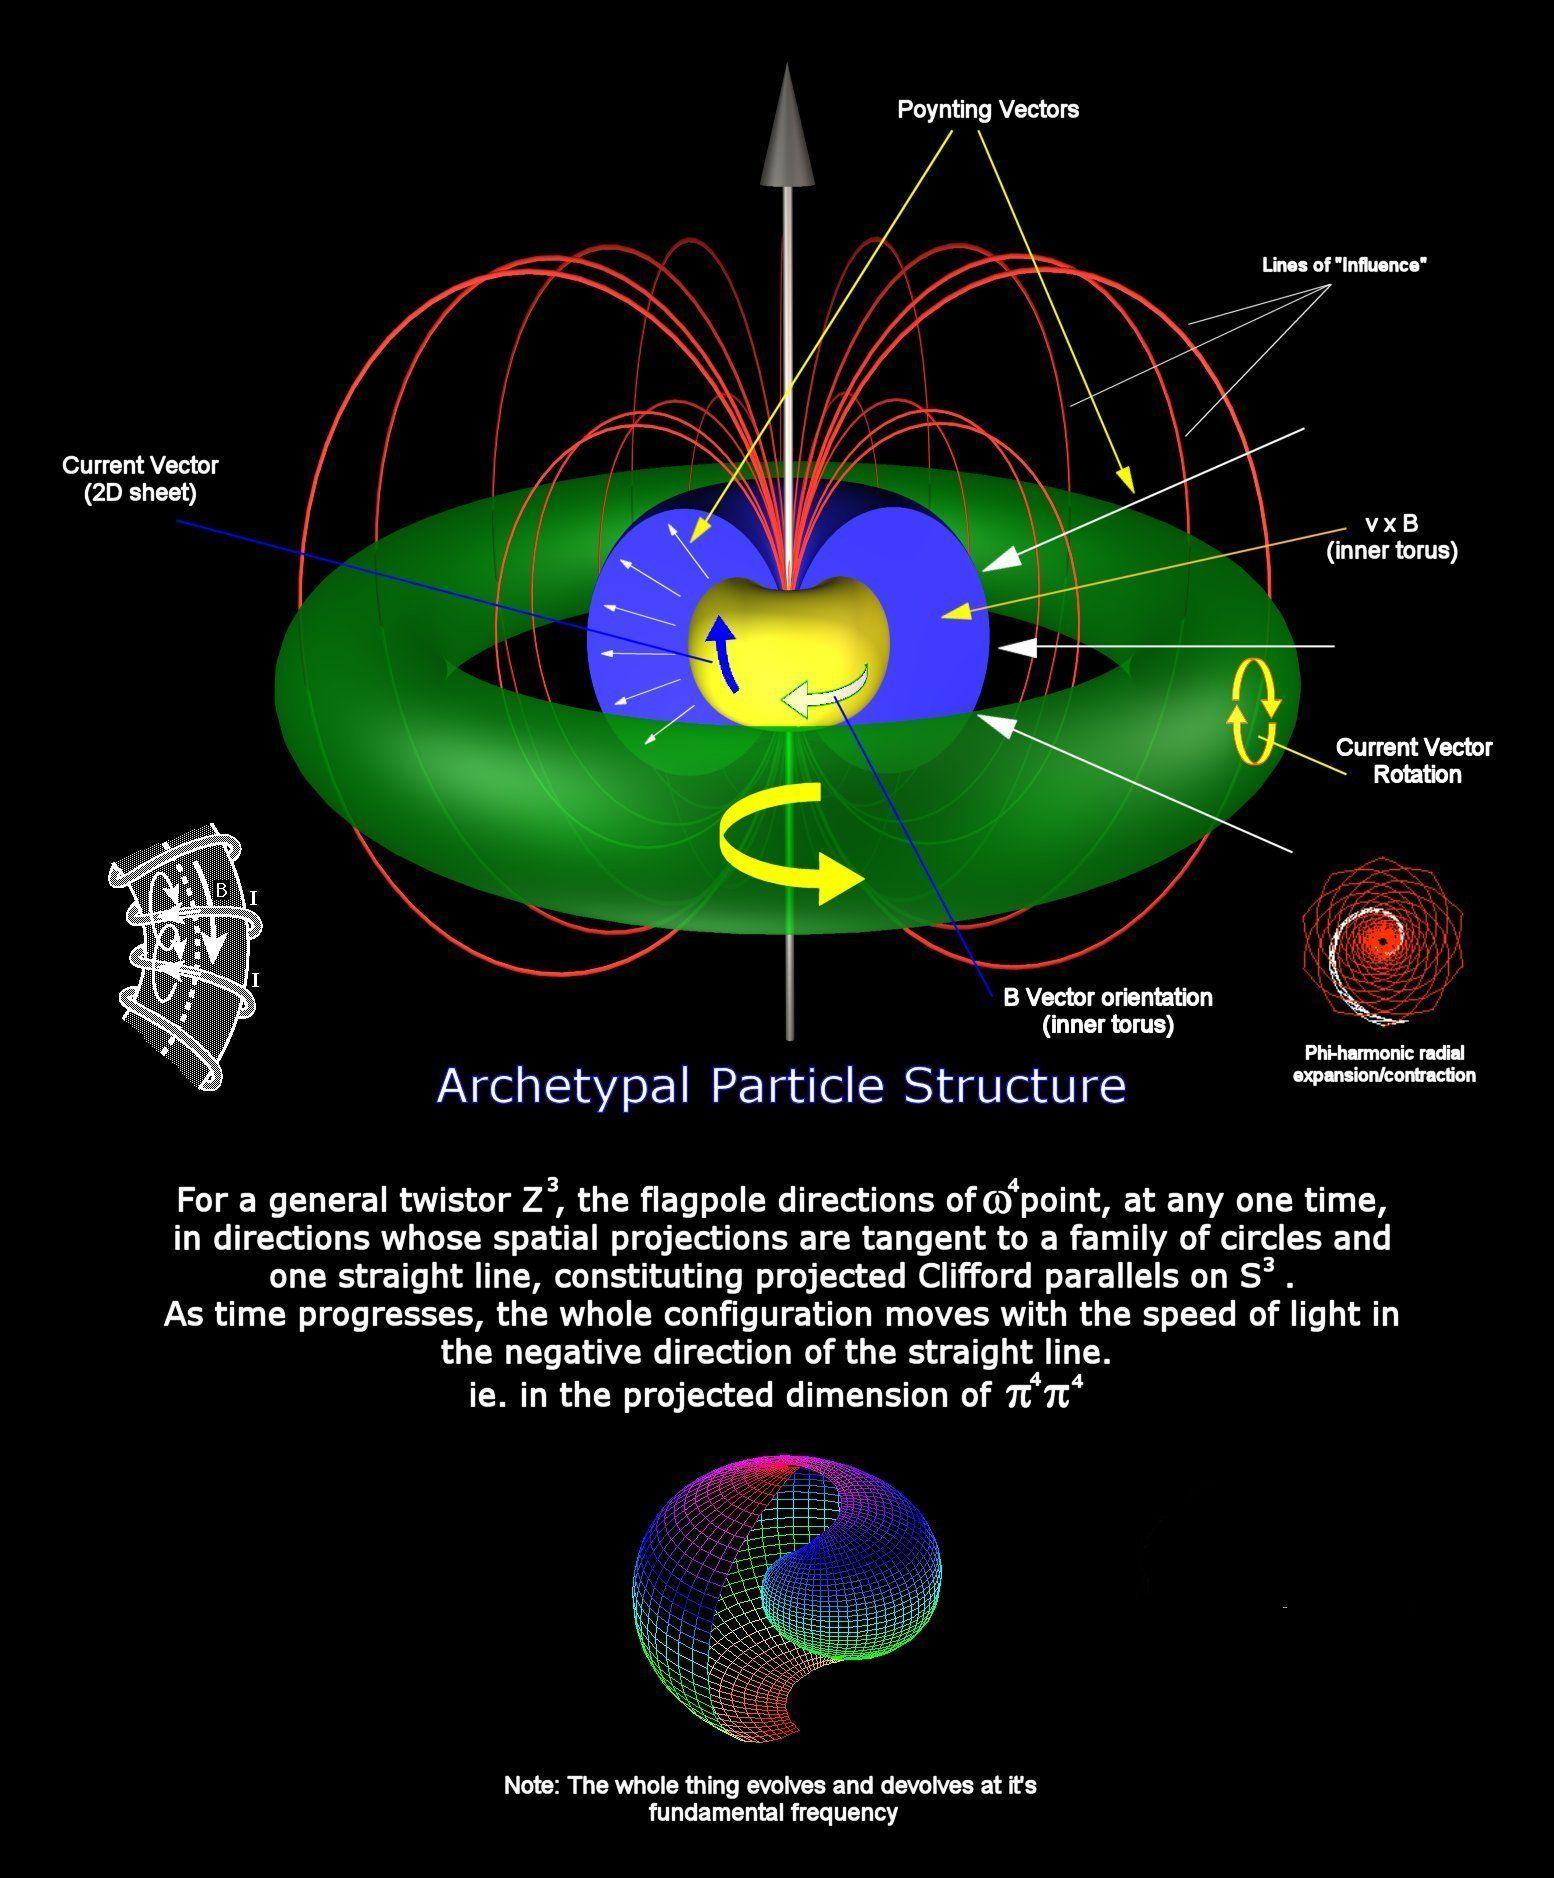 archetypal particle structure physics and mathematics modern physics quantum physics atomic theory  [ 1554 x 1878 Pixel ]